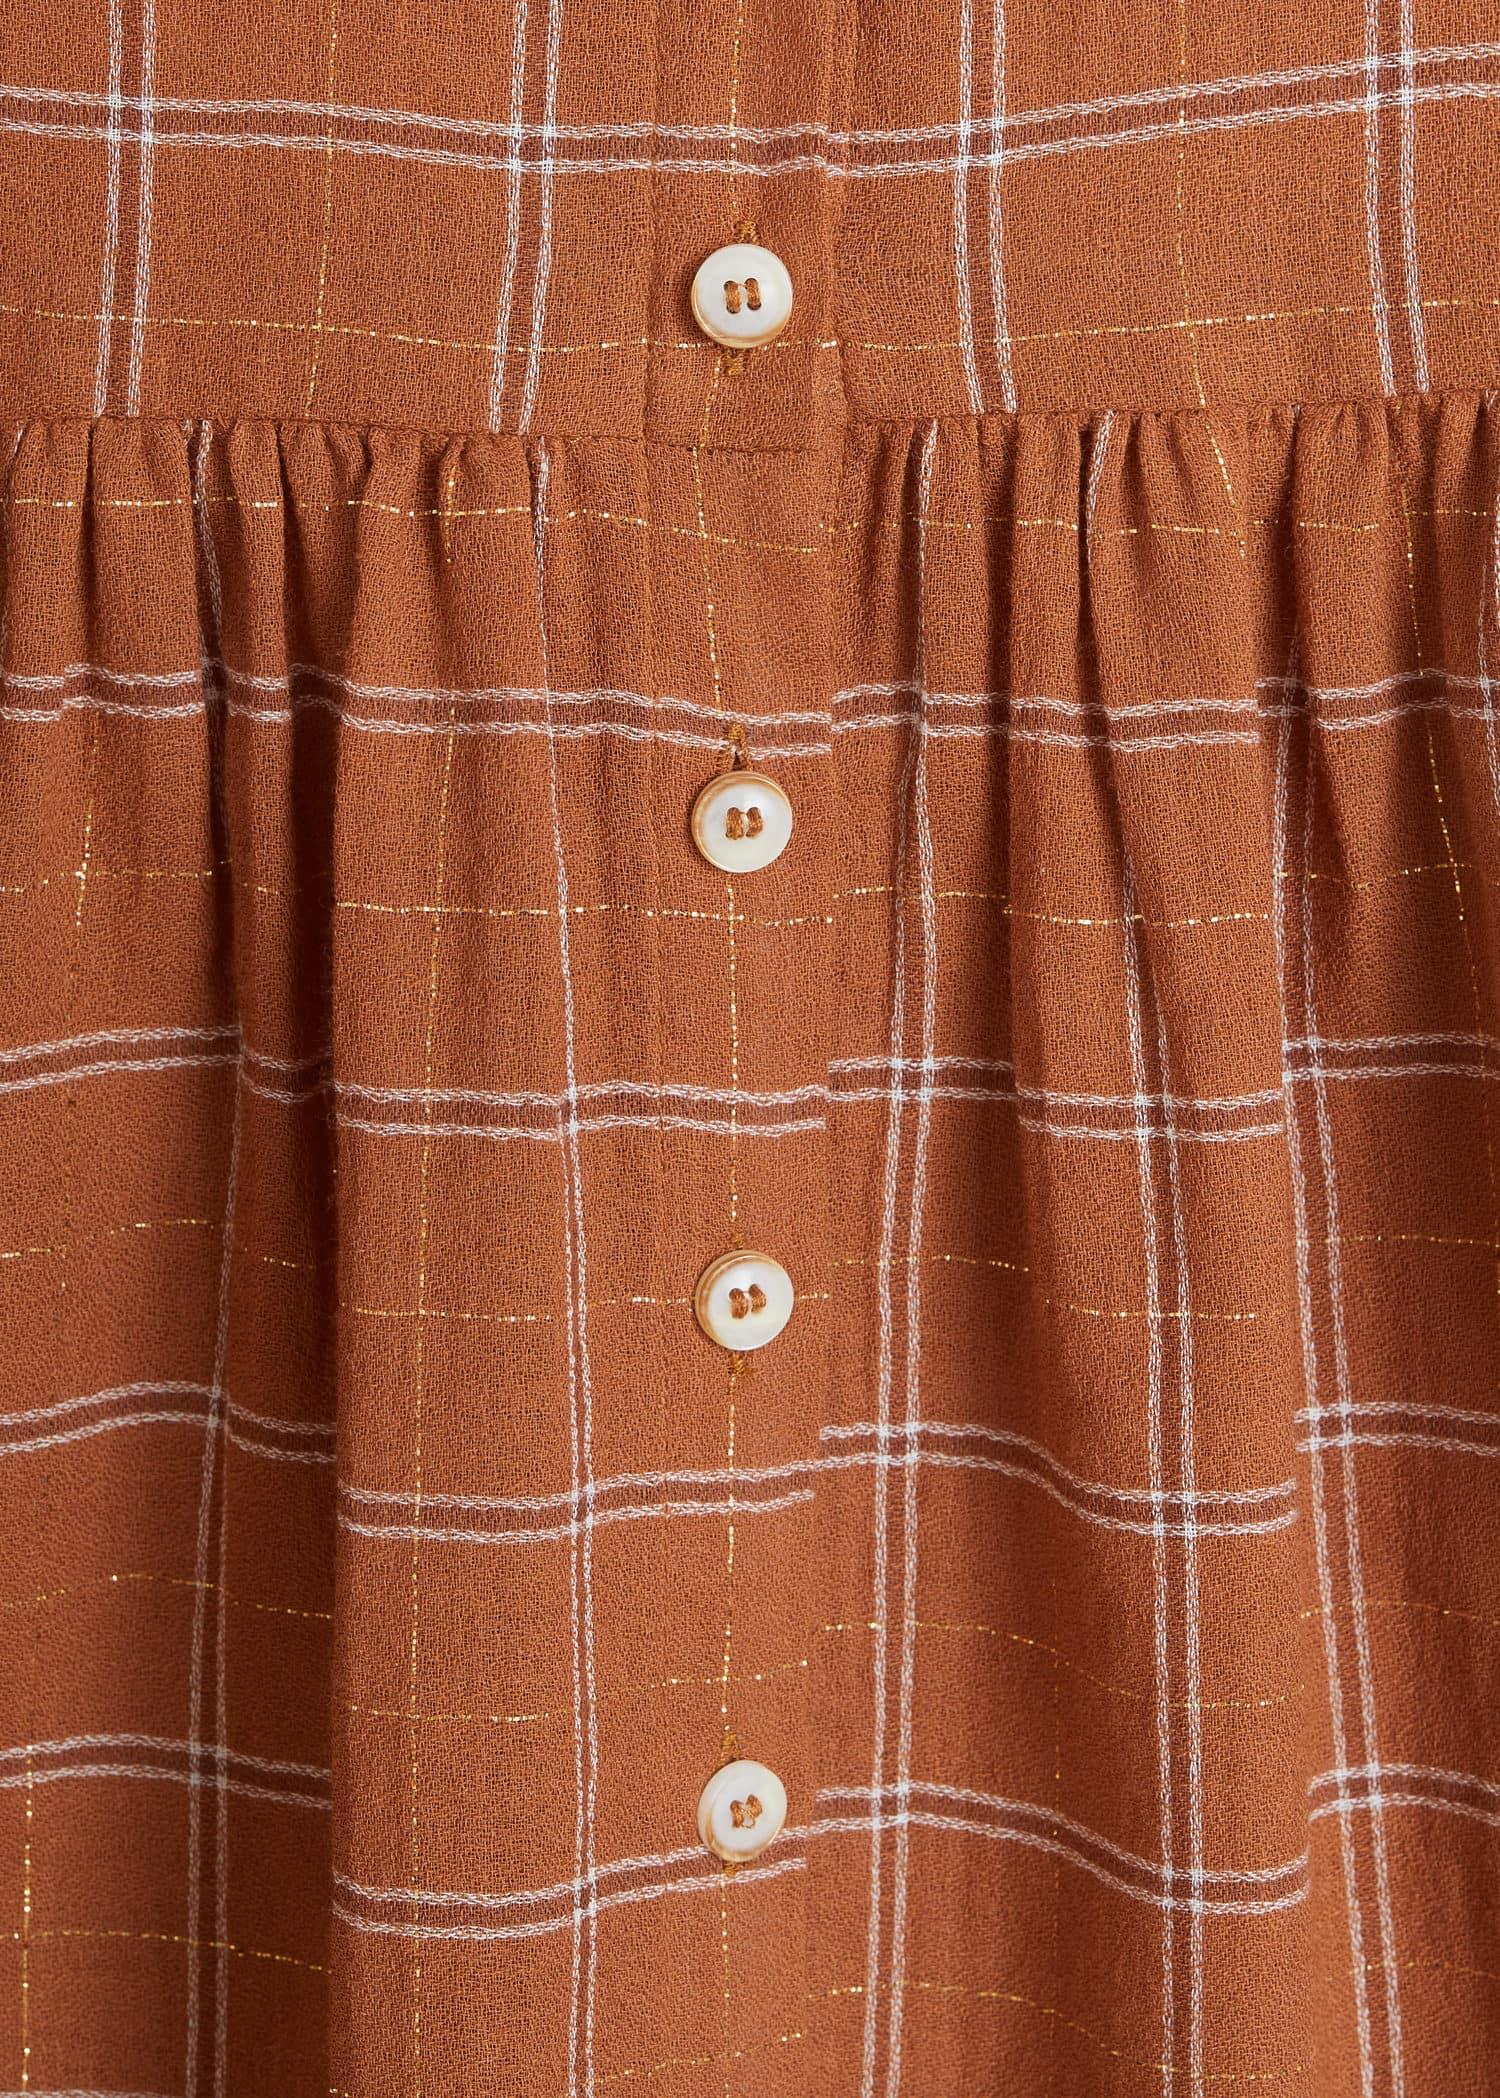 Rutete bluse i bomull Skjorter Store størrelser | OUTLET Norge